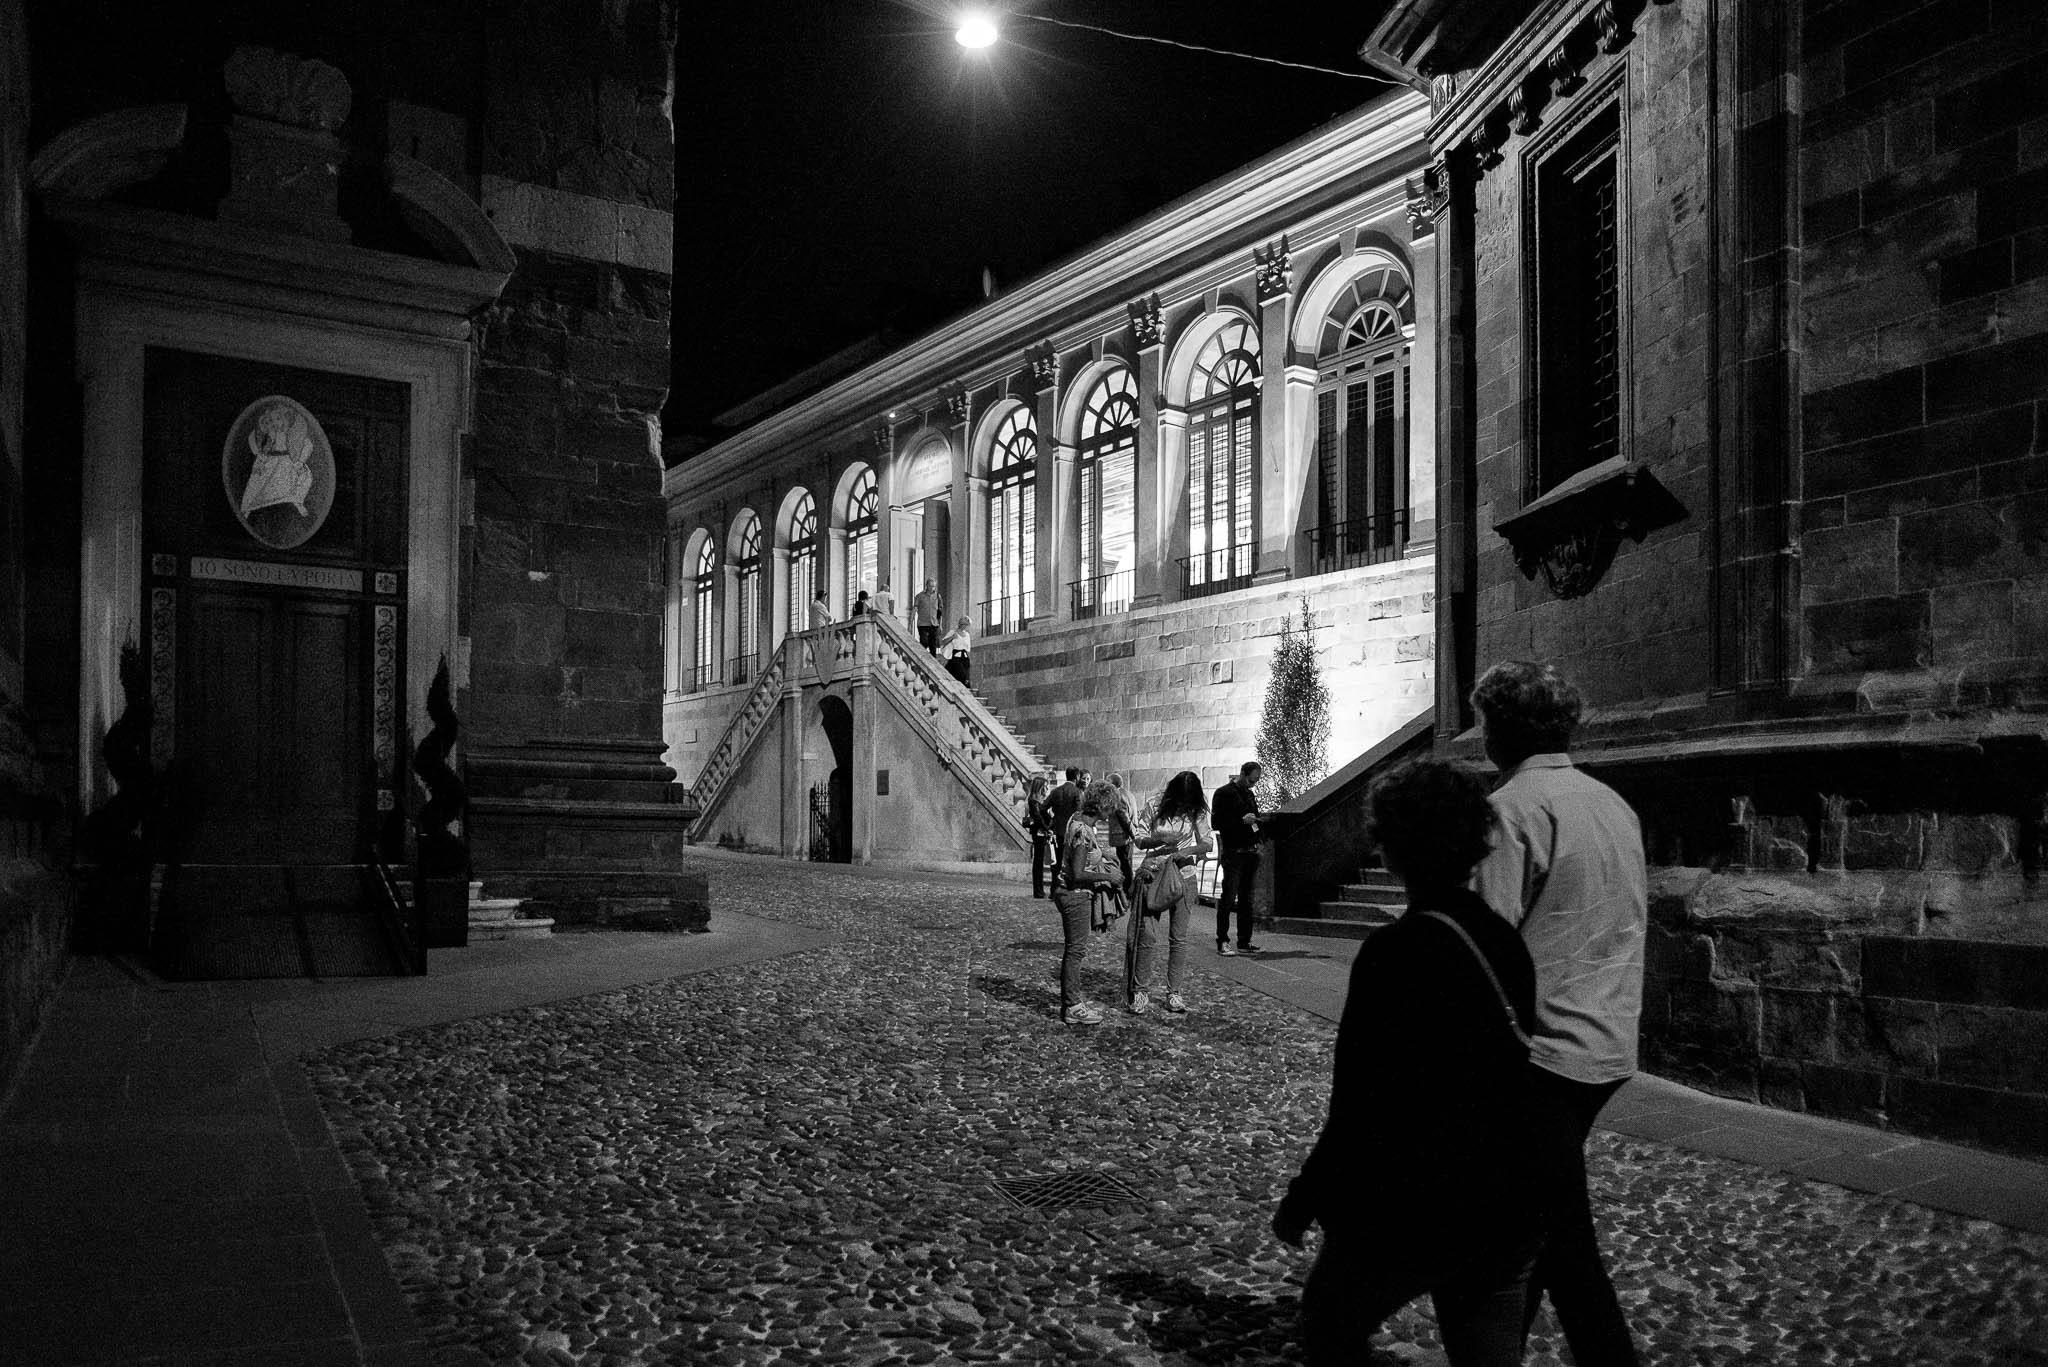 A walk in my wonderful old city by roberto.fustinoni.60